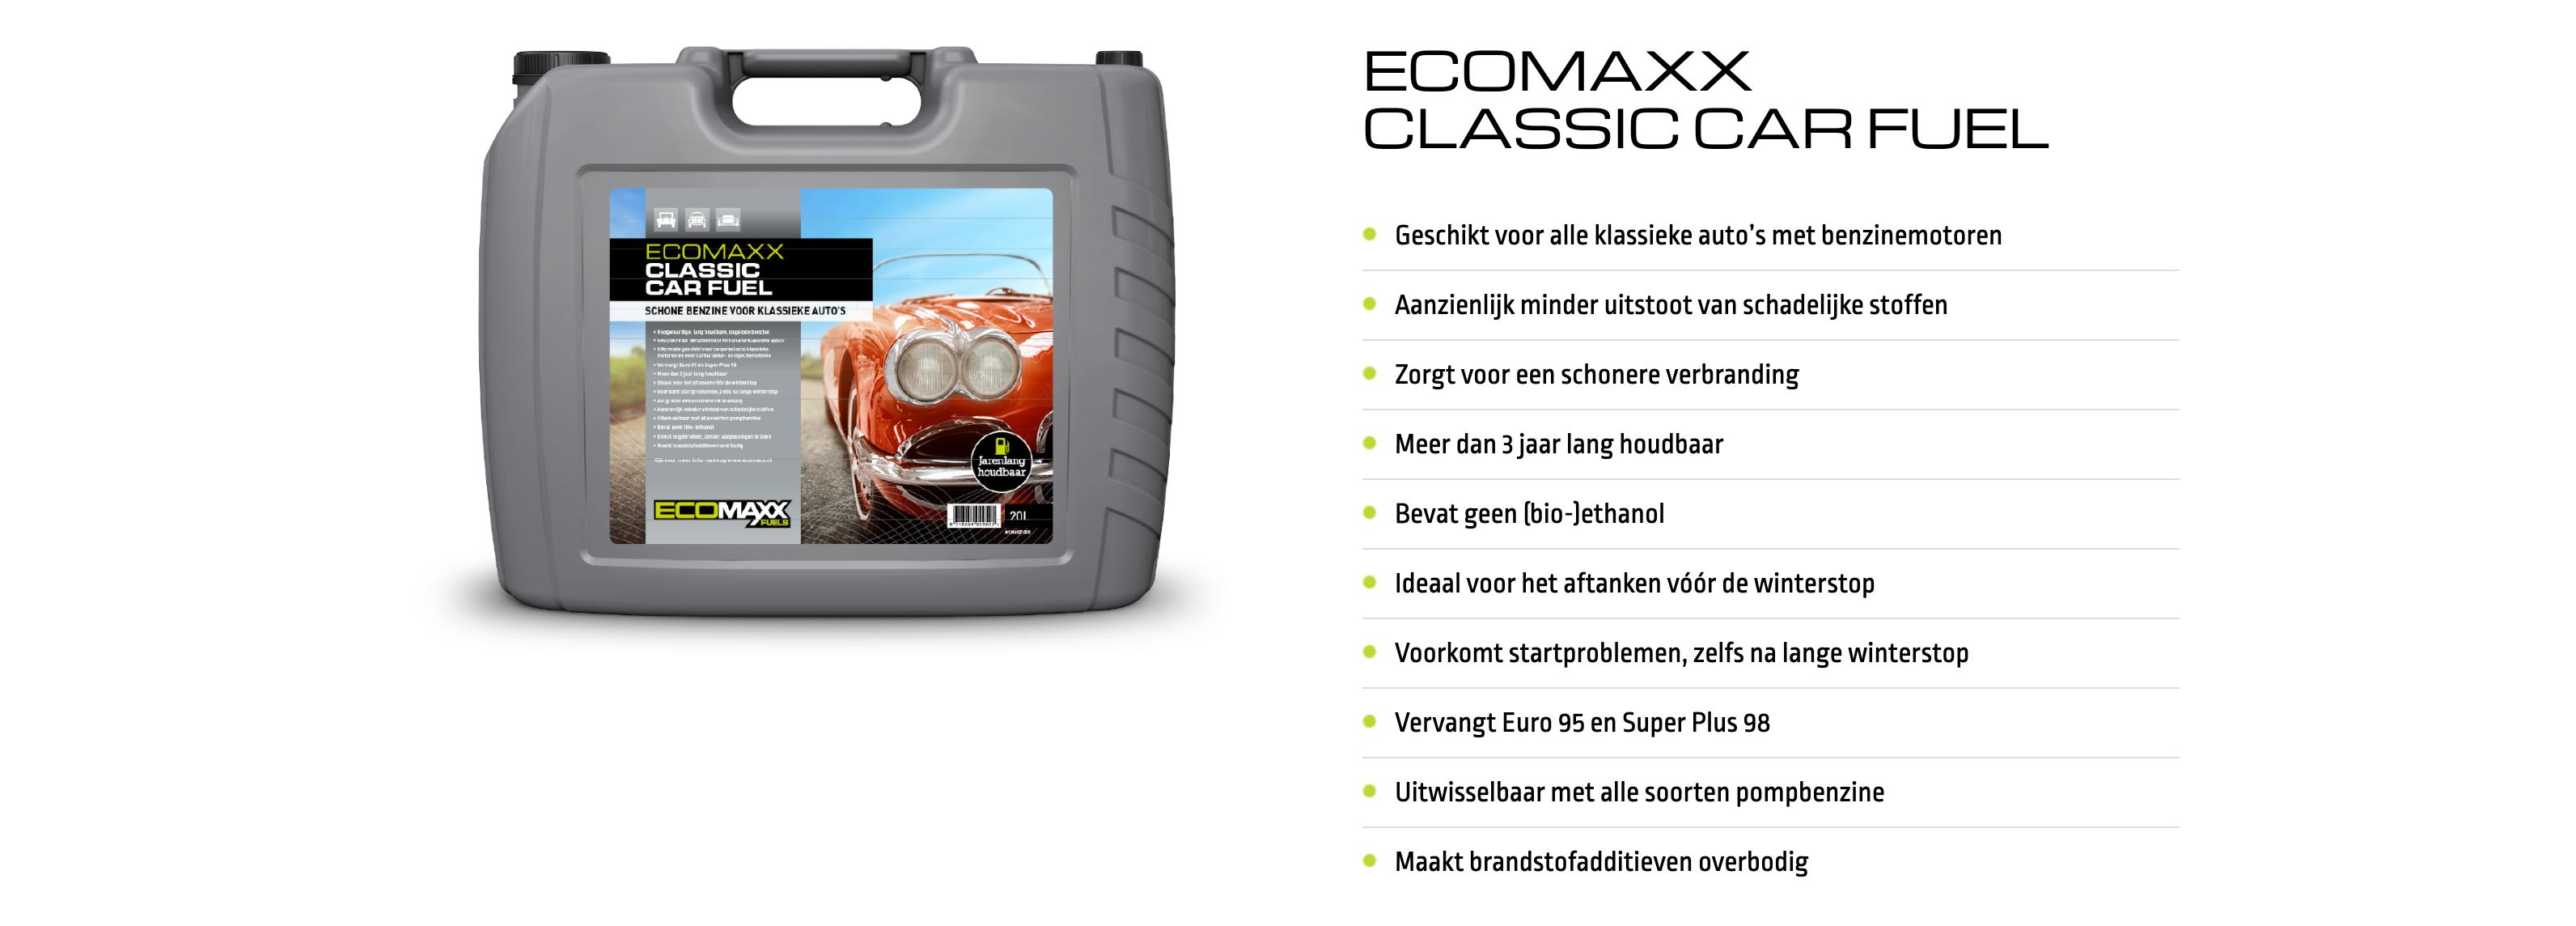 ecomaxx brandstof voor oldtimer autos